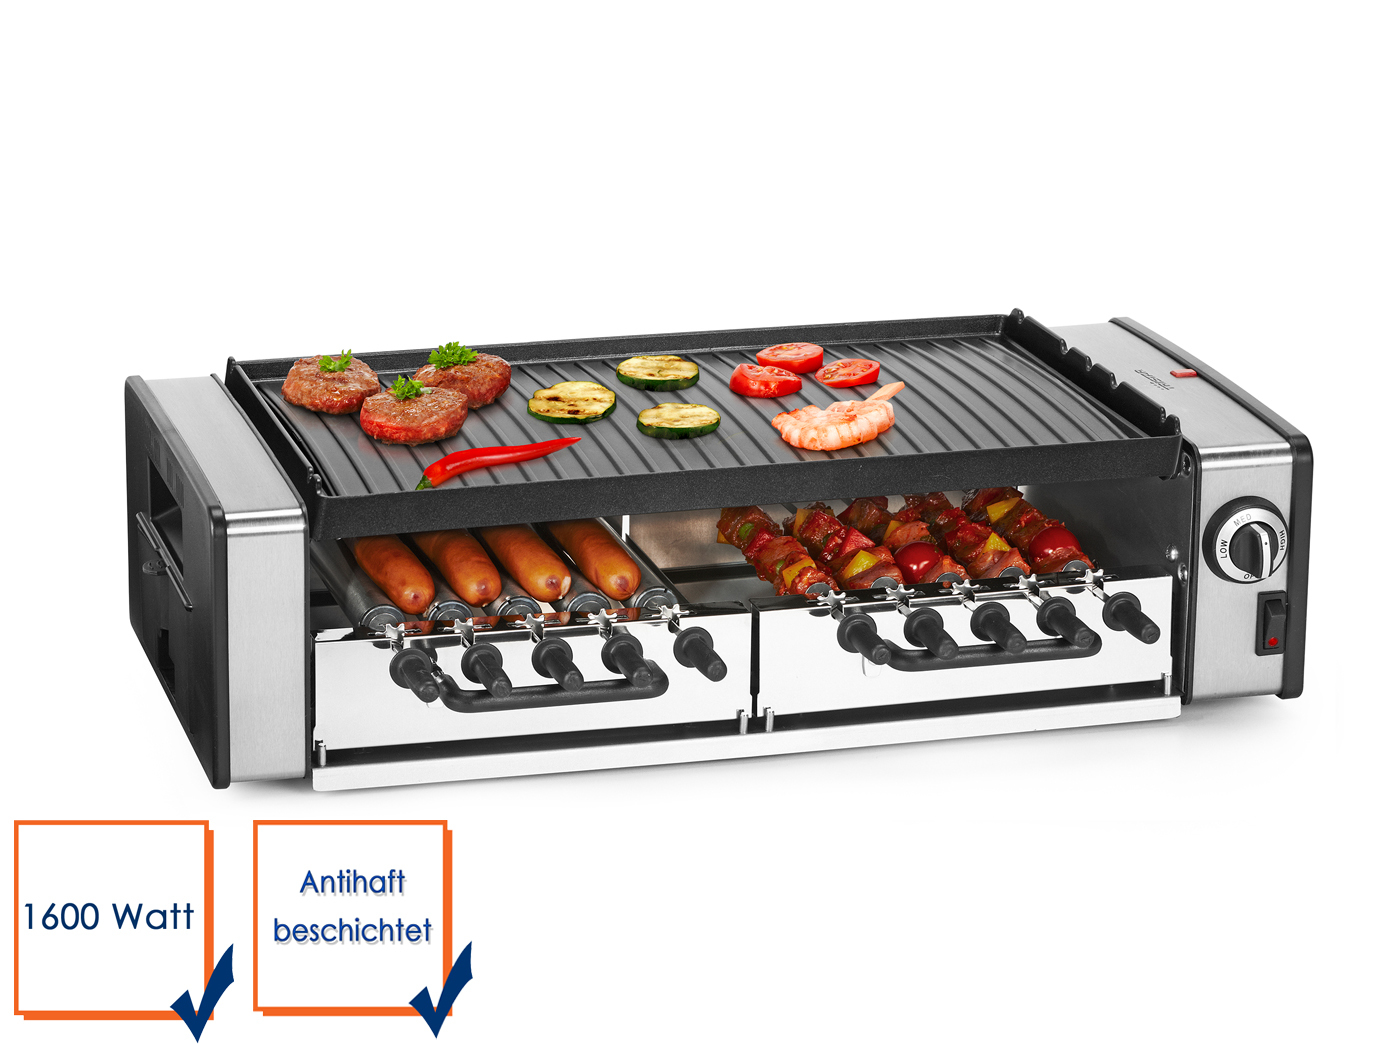 elektrogrill tischgrill 1600w, grill drehspieße, partygrill balkon